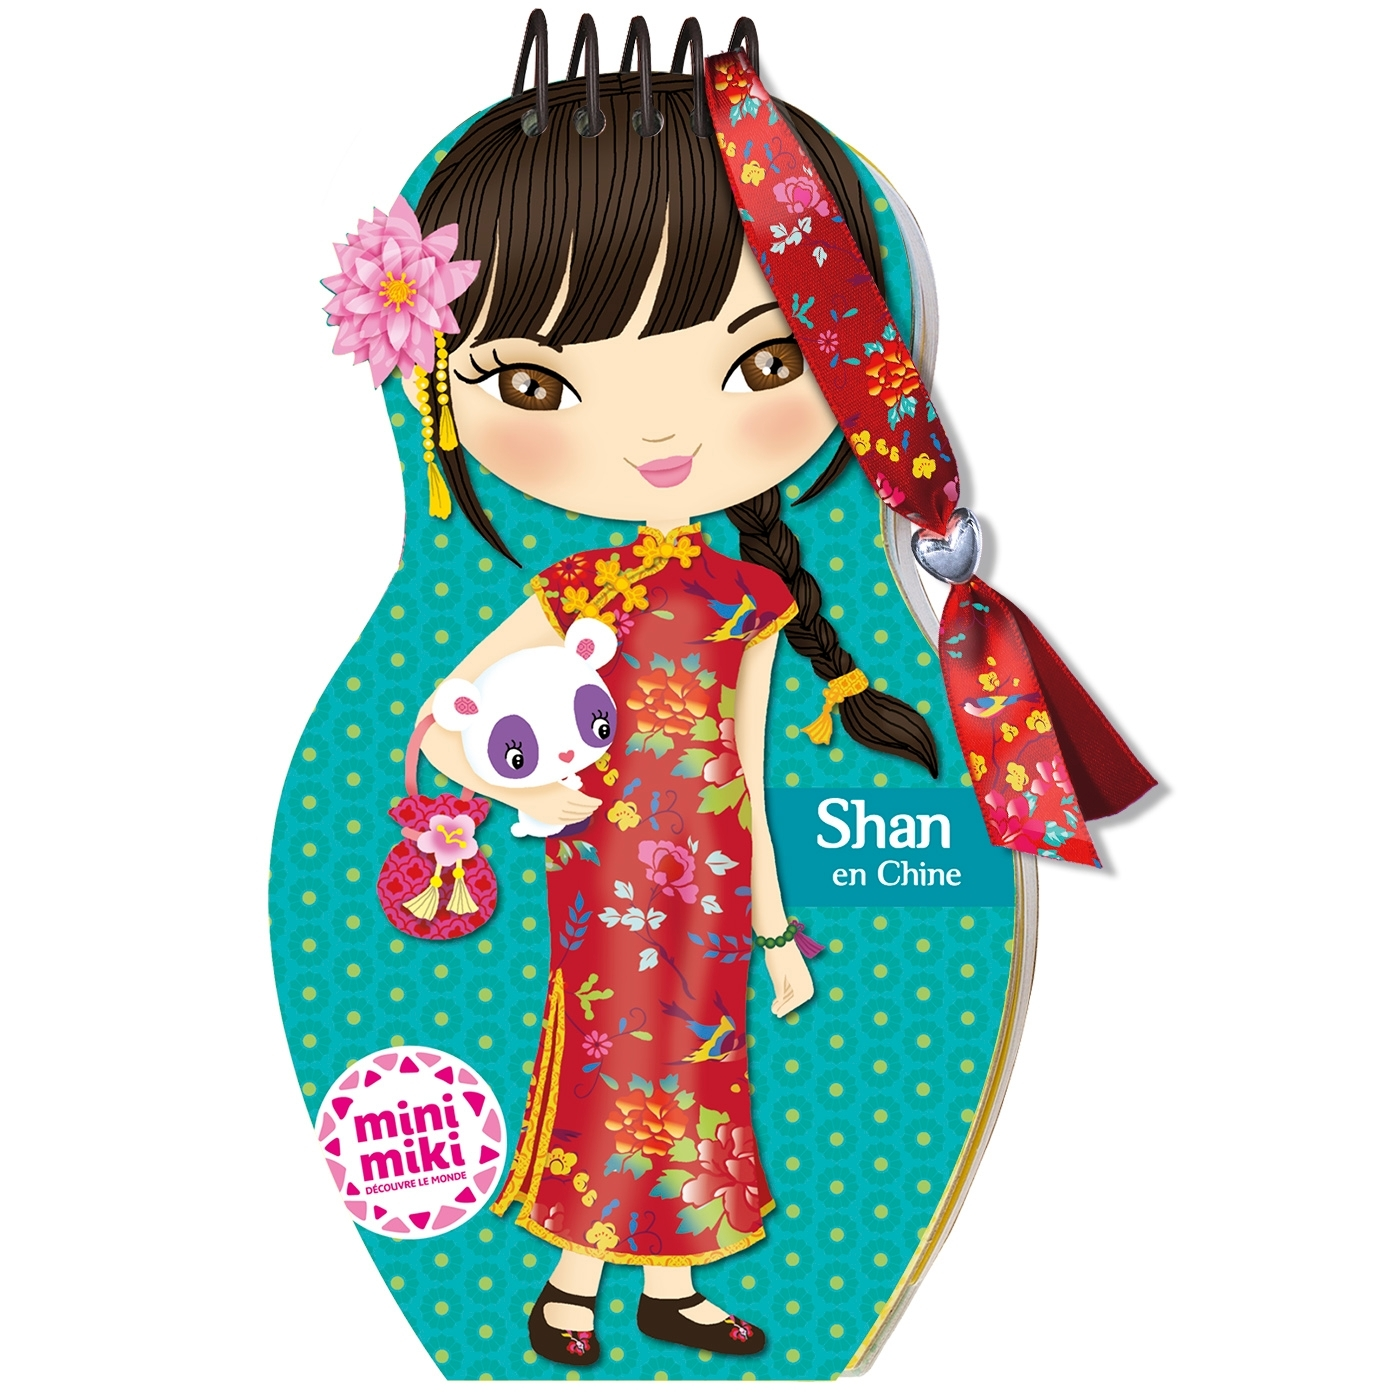 MINIMIKI - CARNET CREATIF - SHAN EN CHINE